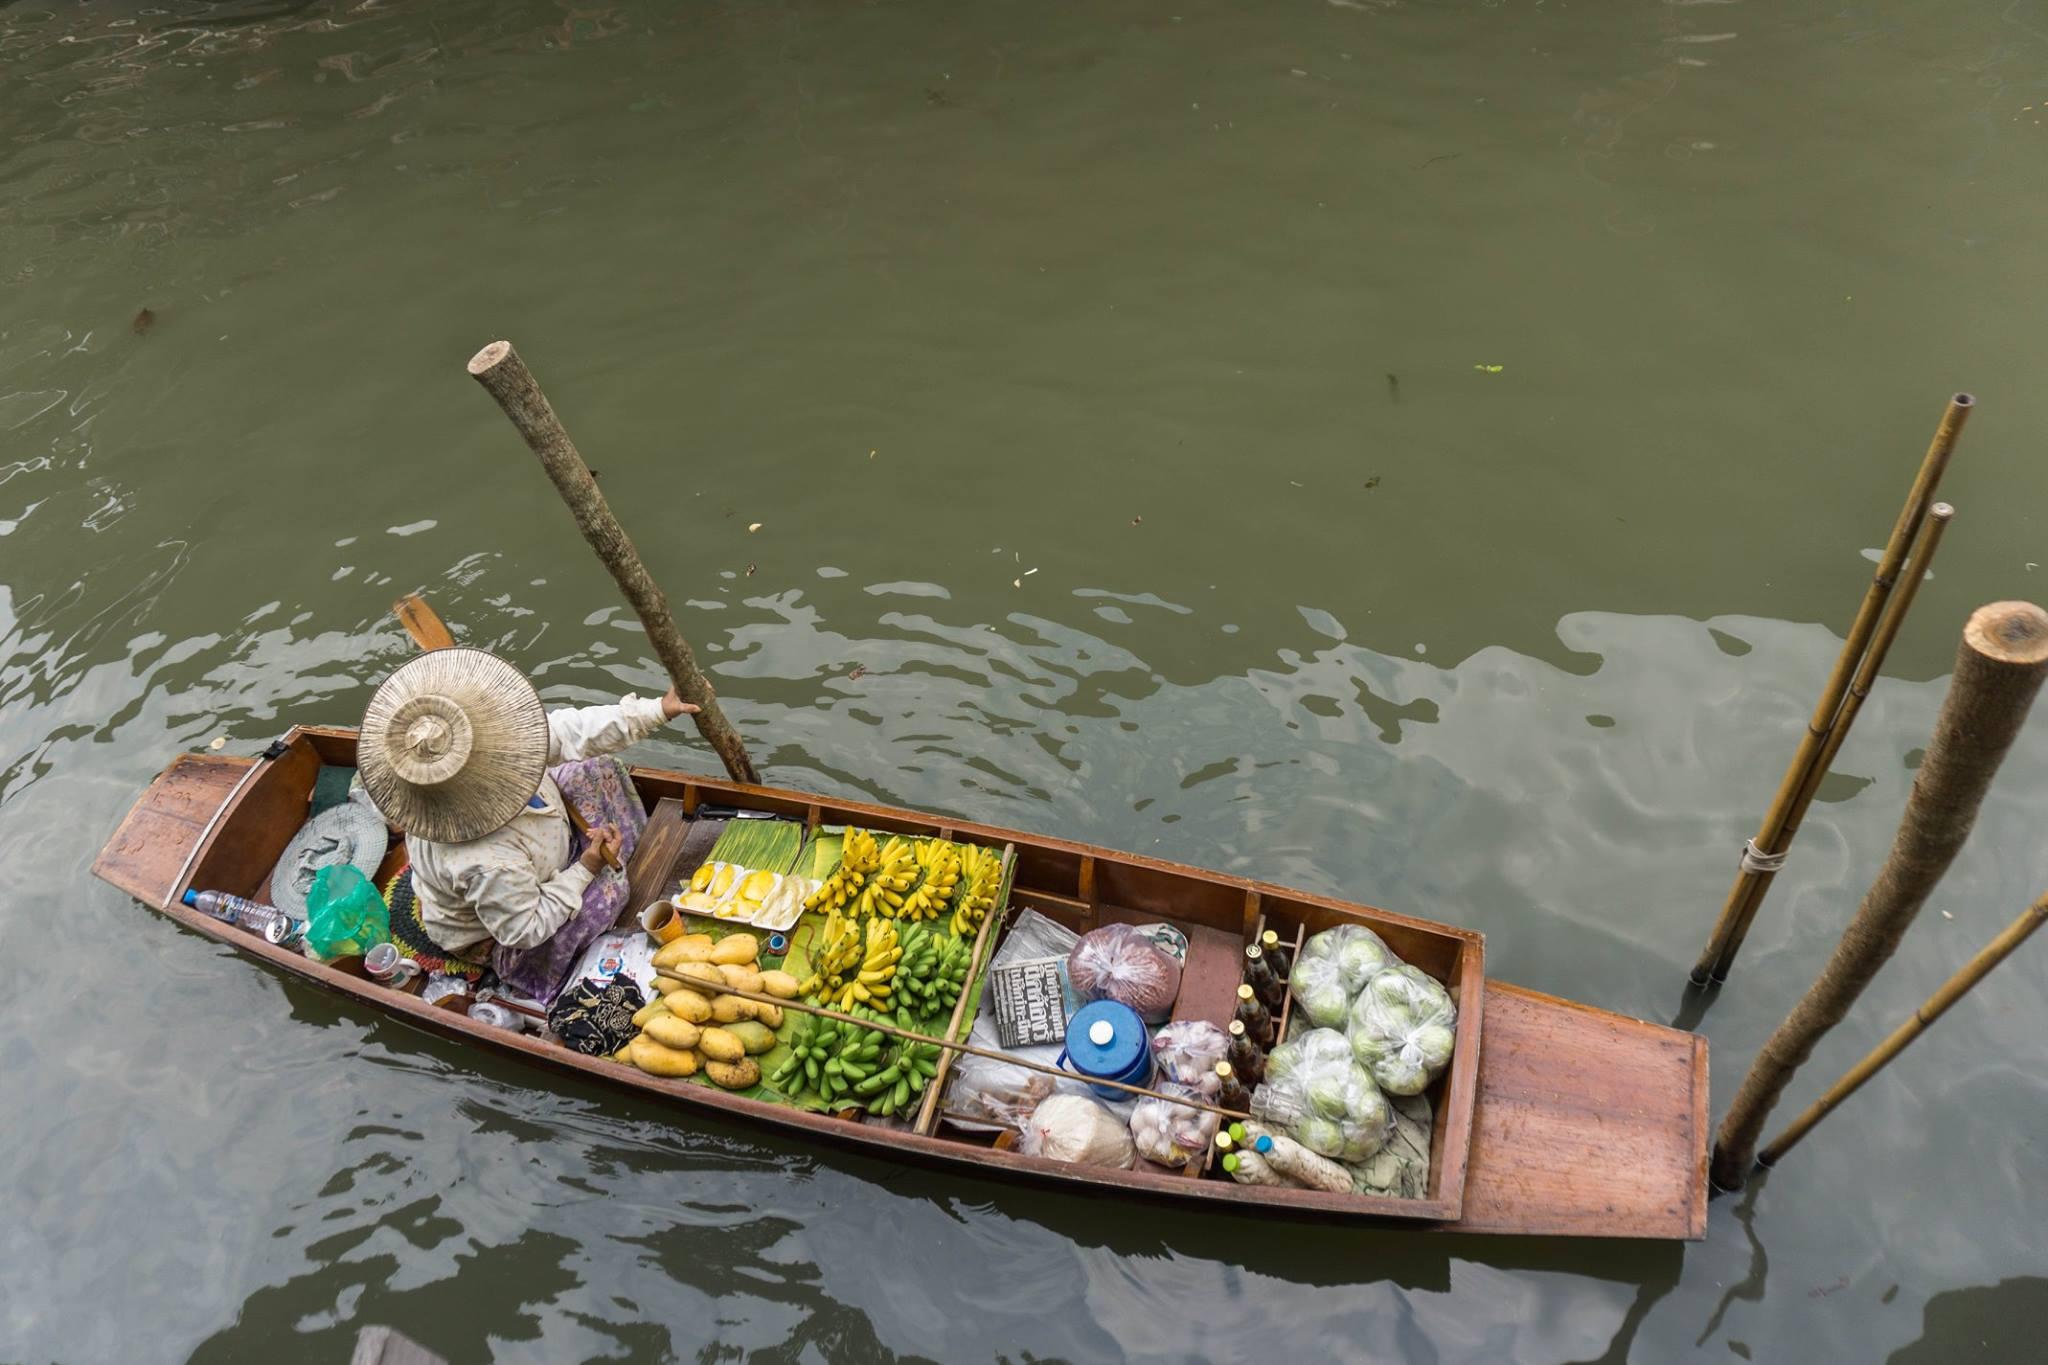 thai-boat-kim-lawson.jpg